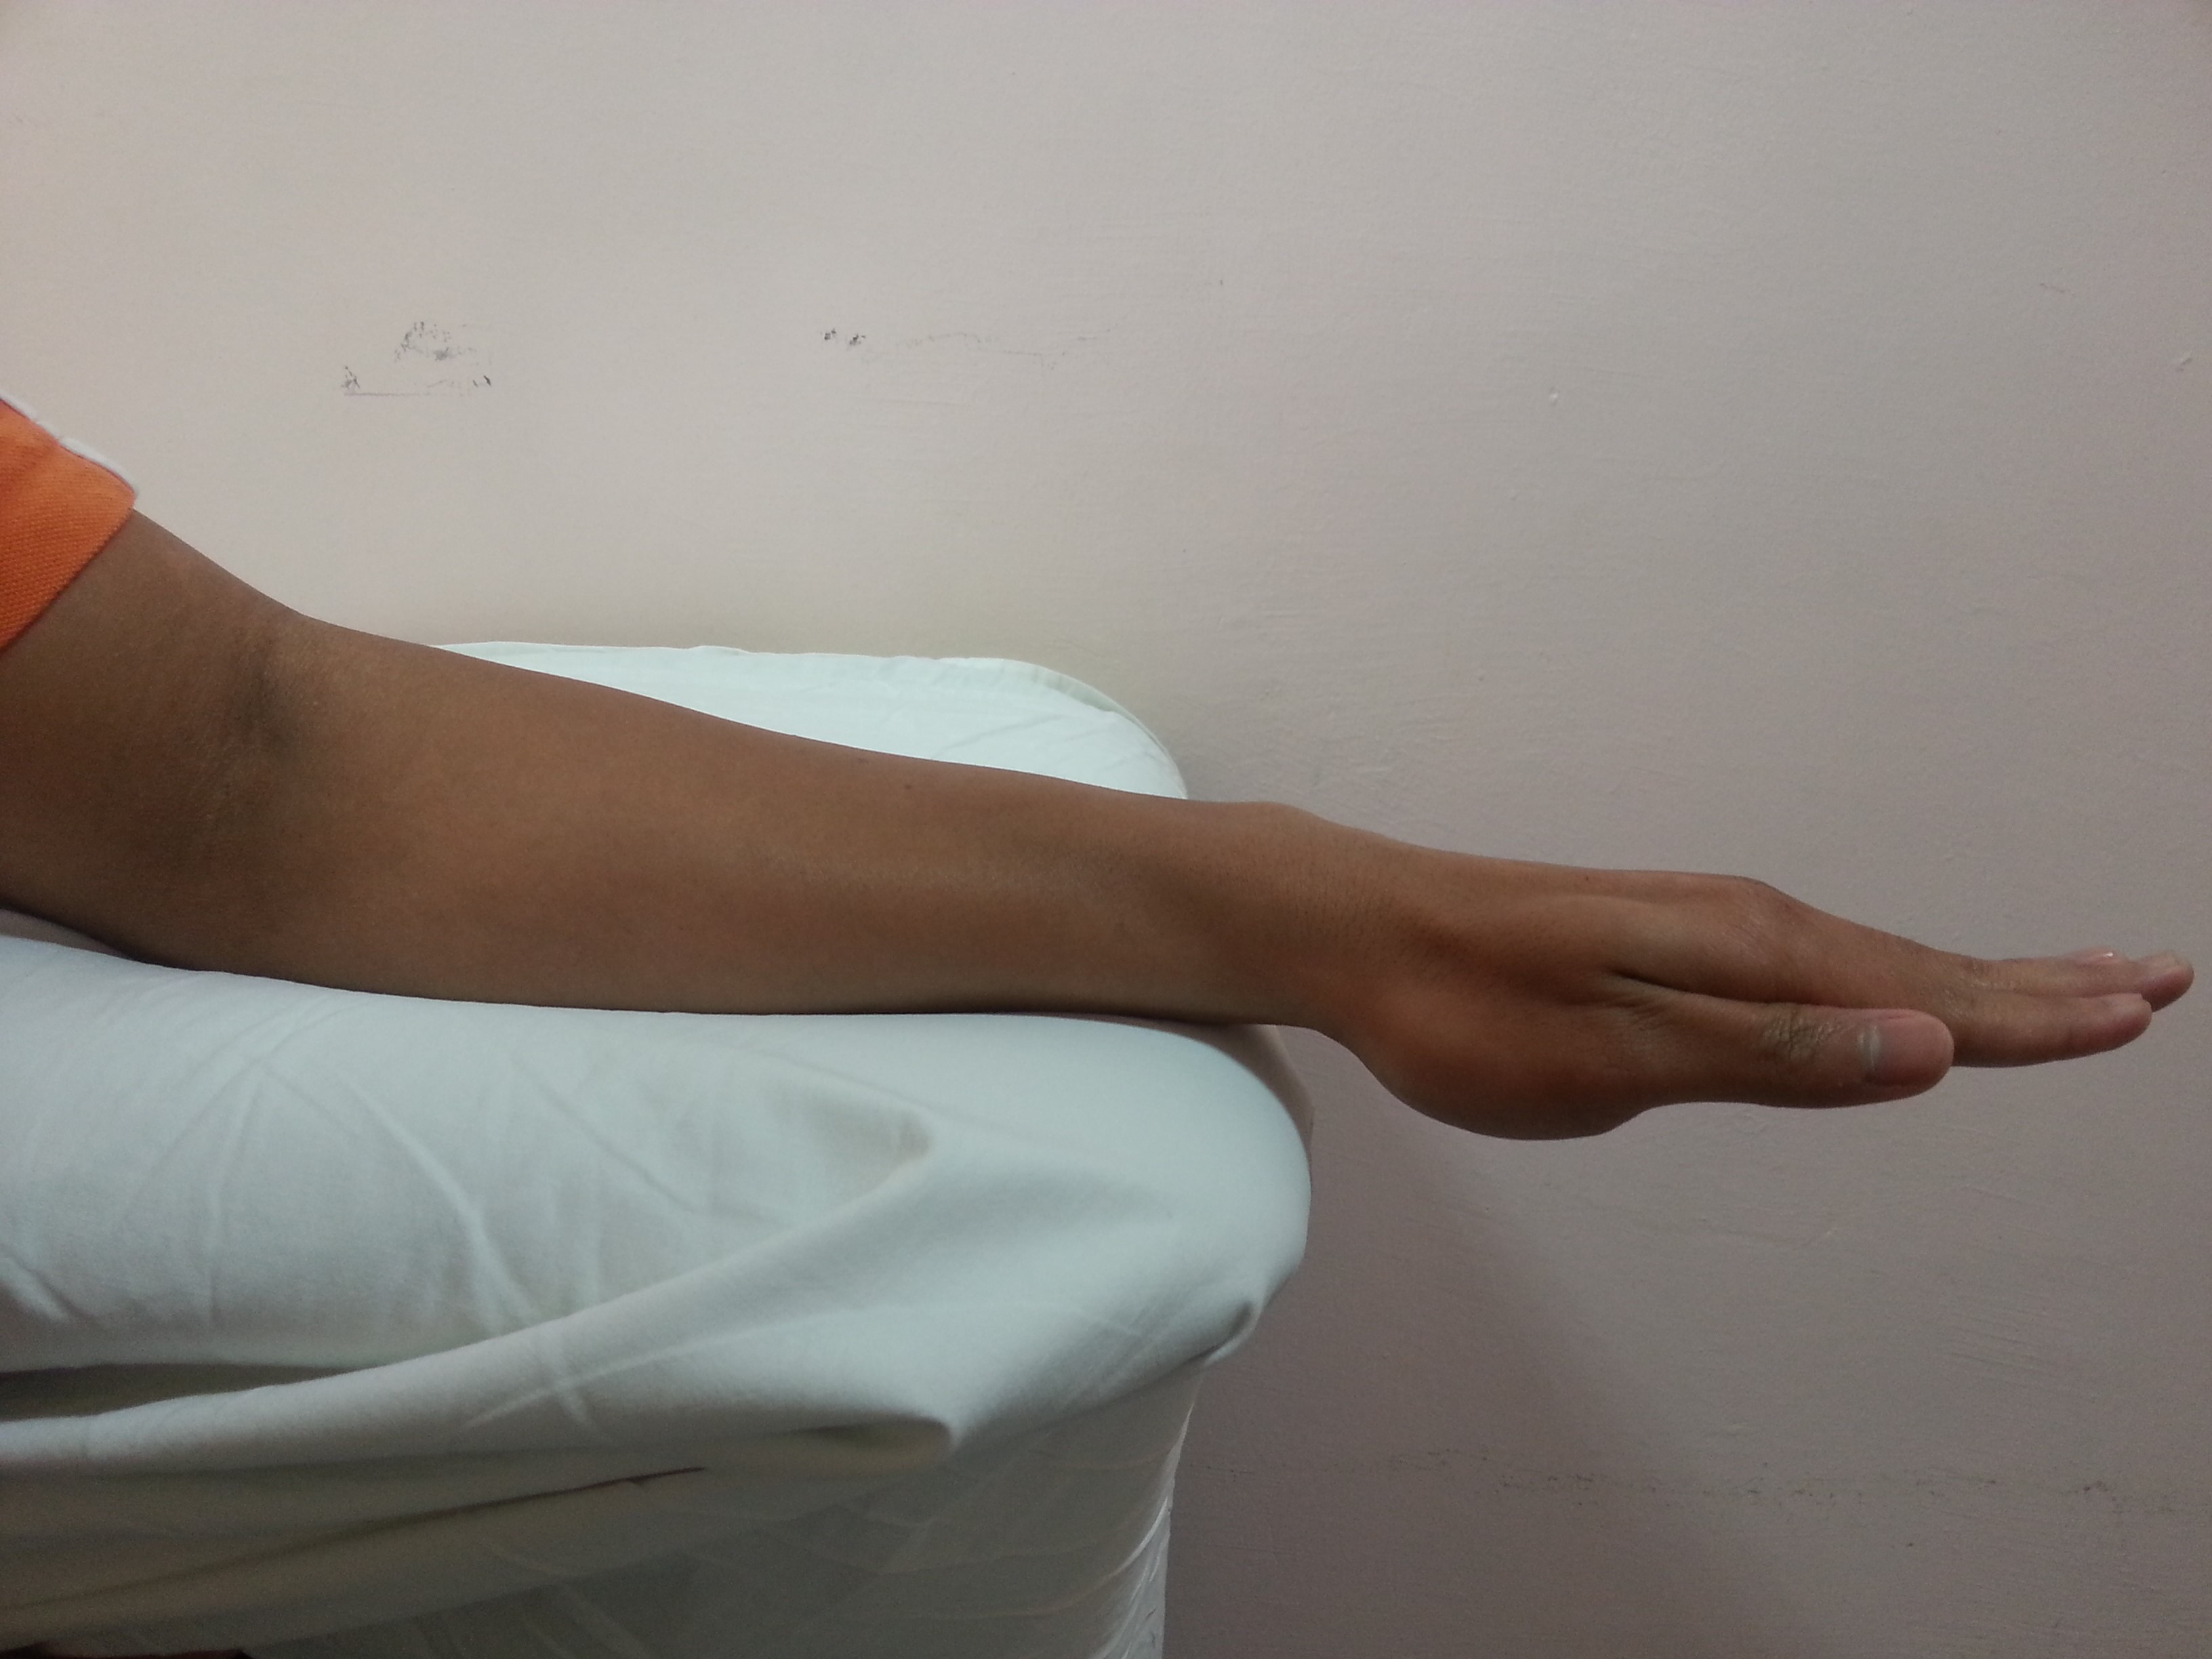 wrist bend1